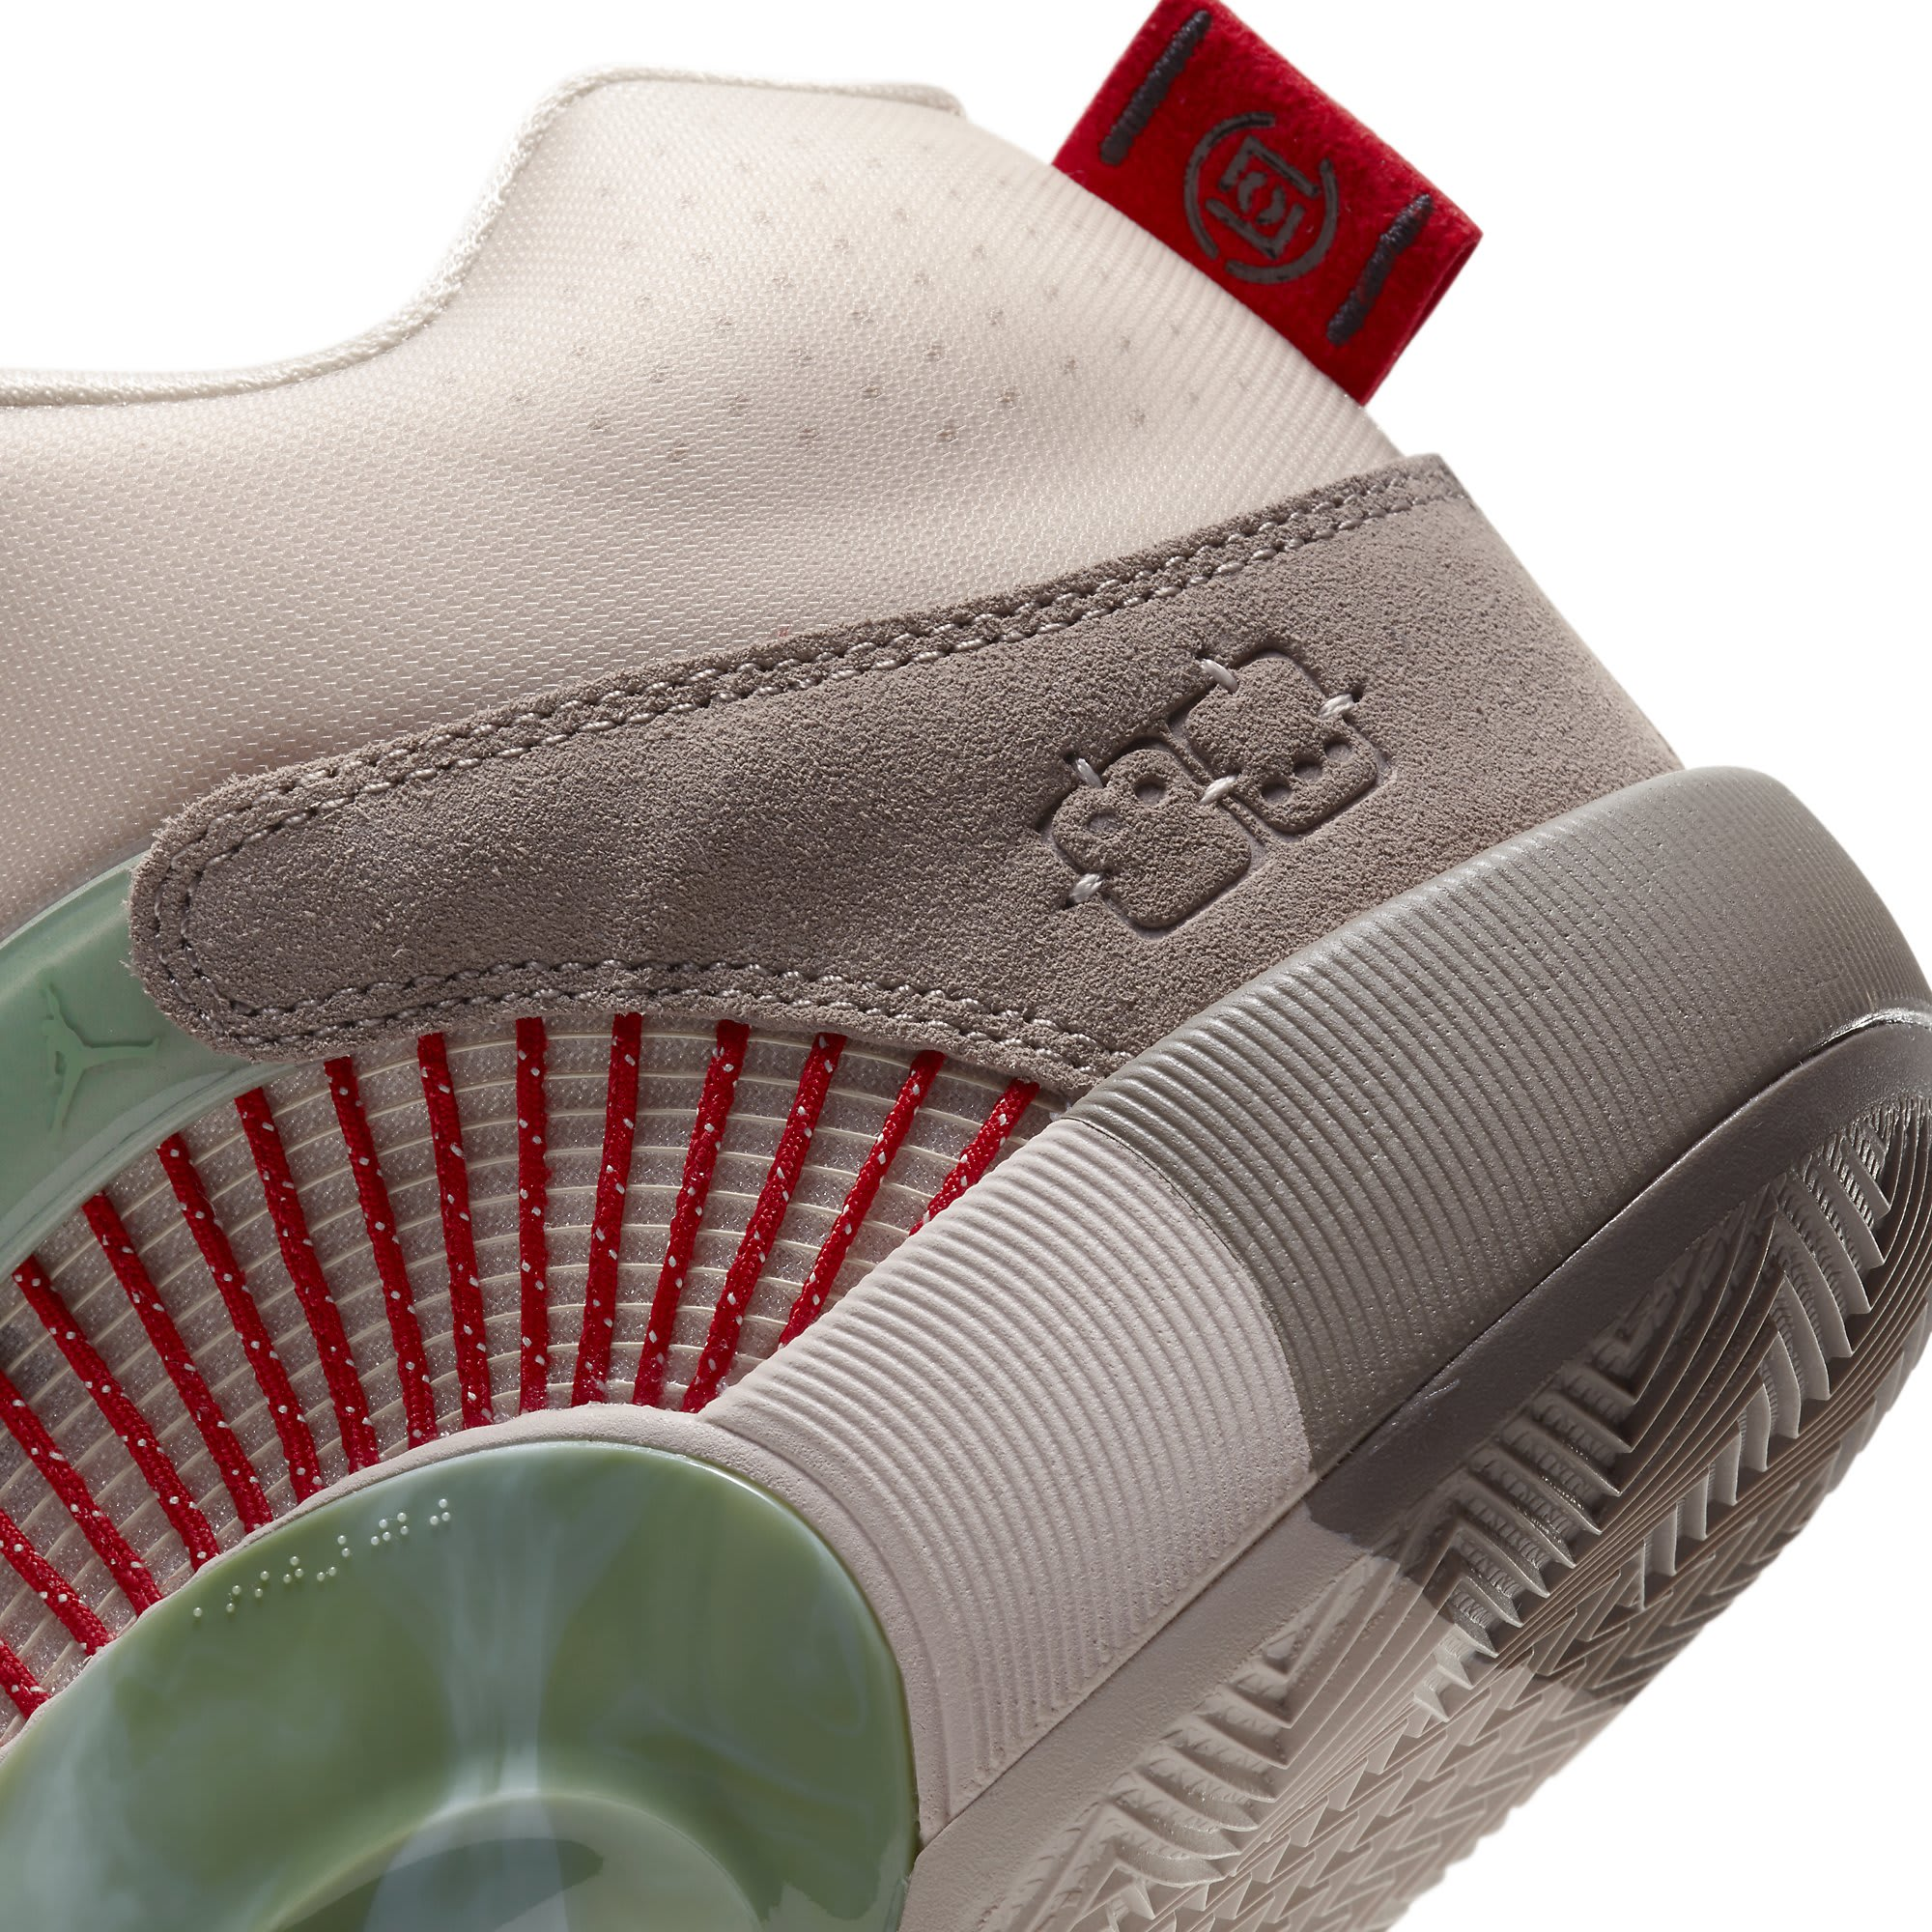 CLOT x Air Jordan 35 DD9322-200 Heel